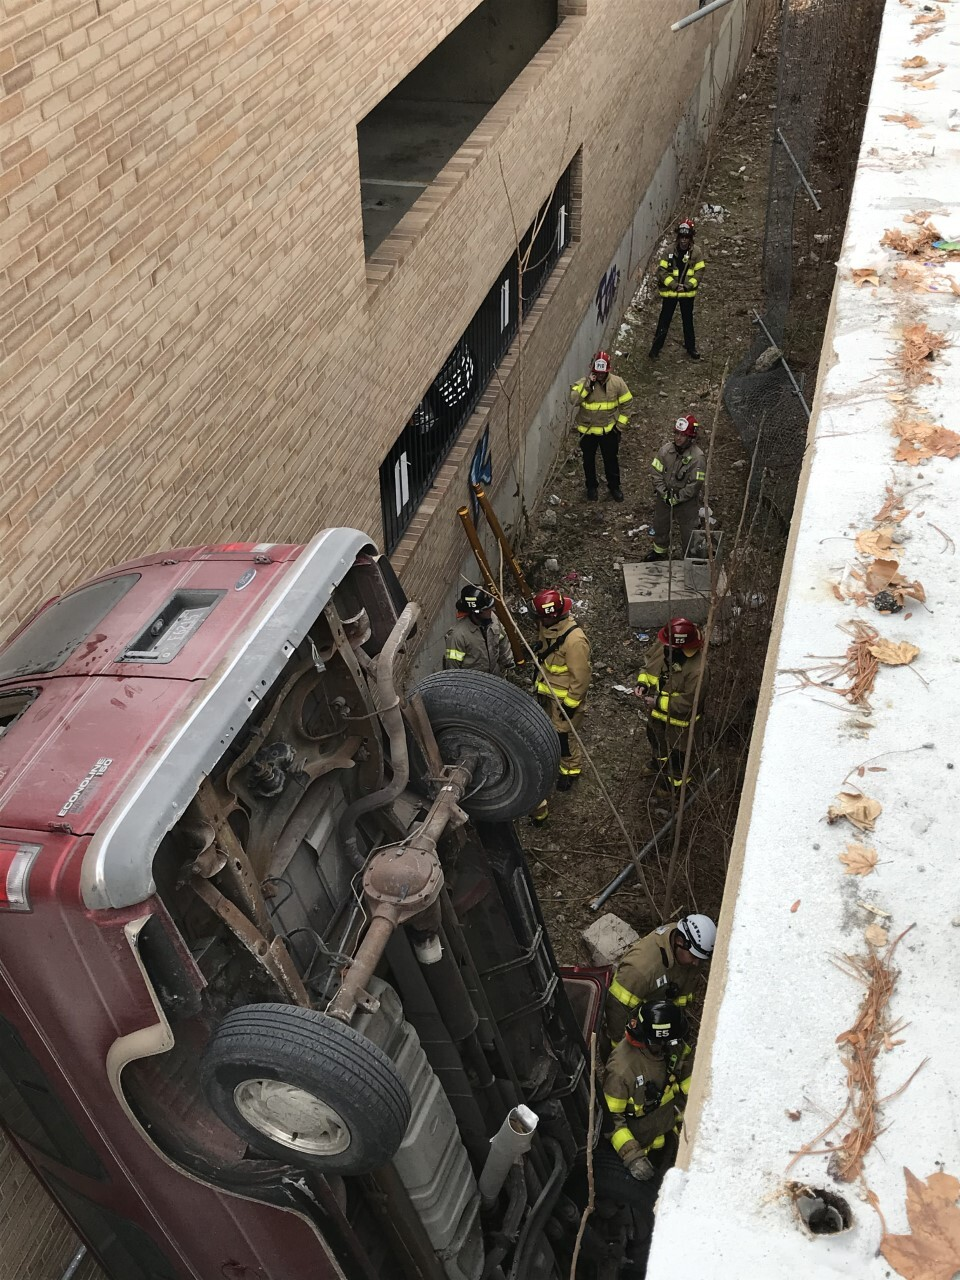 Photos: Man drives van off top of 2-story parking garage in Salt LakeCity